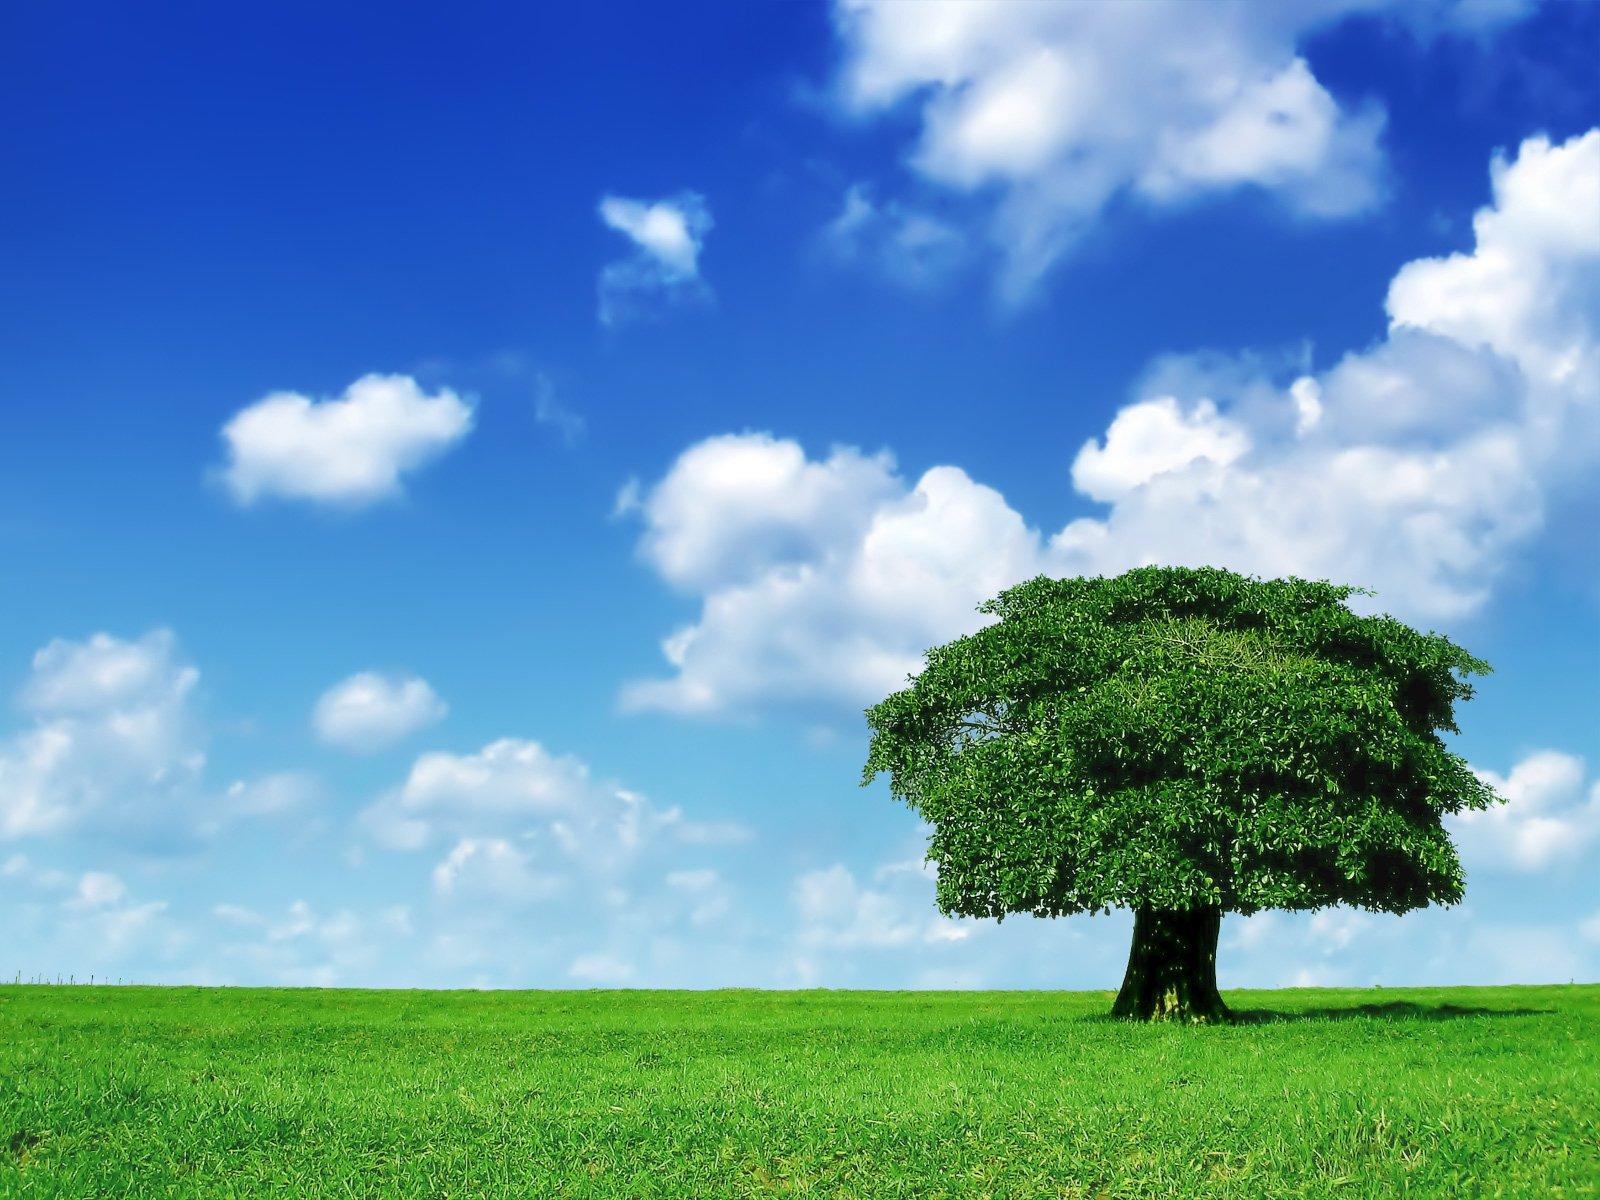 Hd Wallpaper - Grass And A Tree , HD Wallpaper & Backgrounds